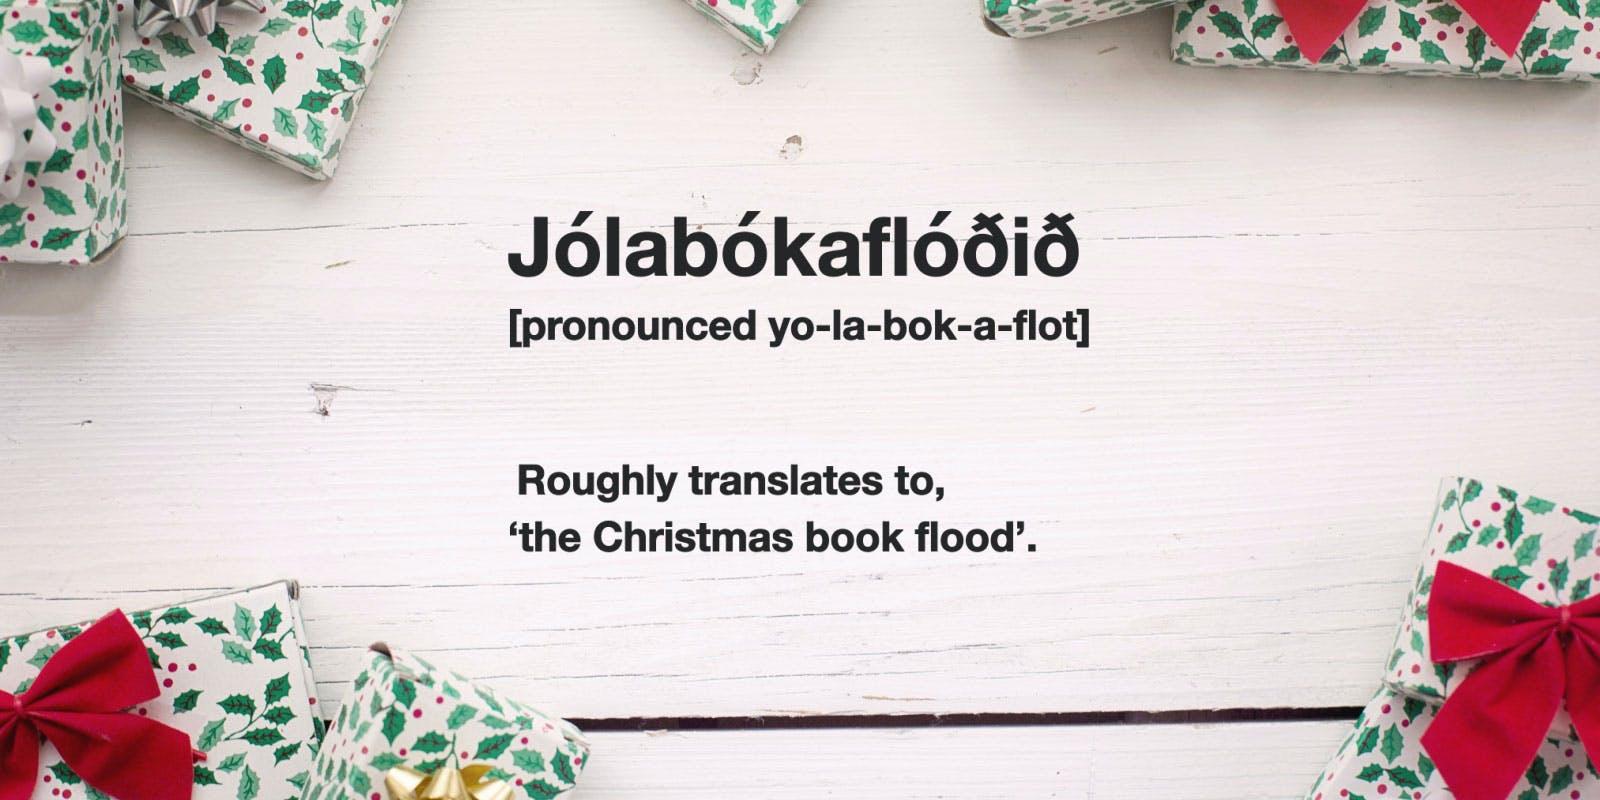 Jolabokaflod - Your new favourite Christmas tradition